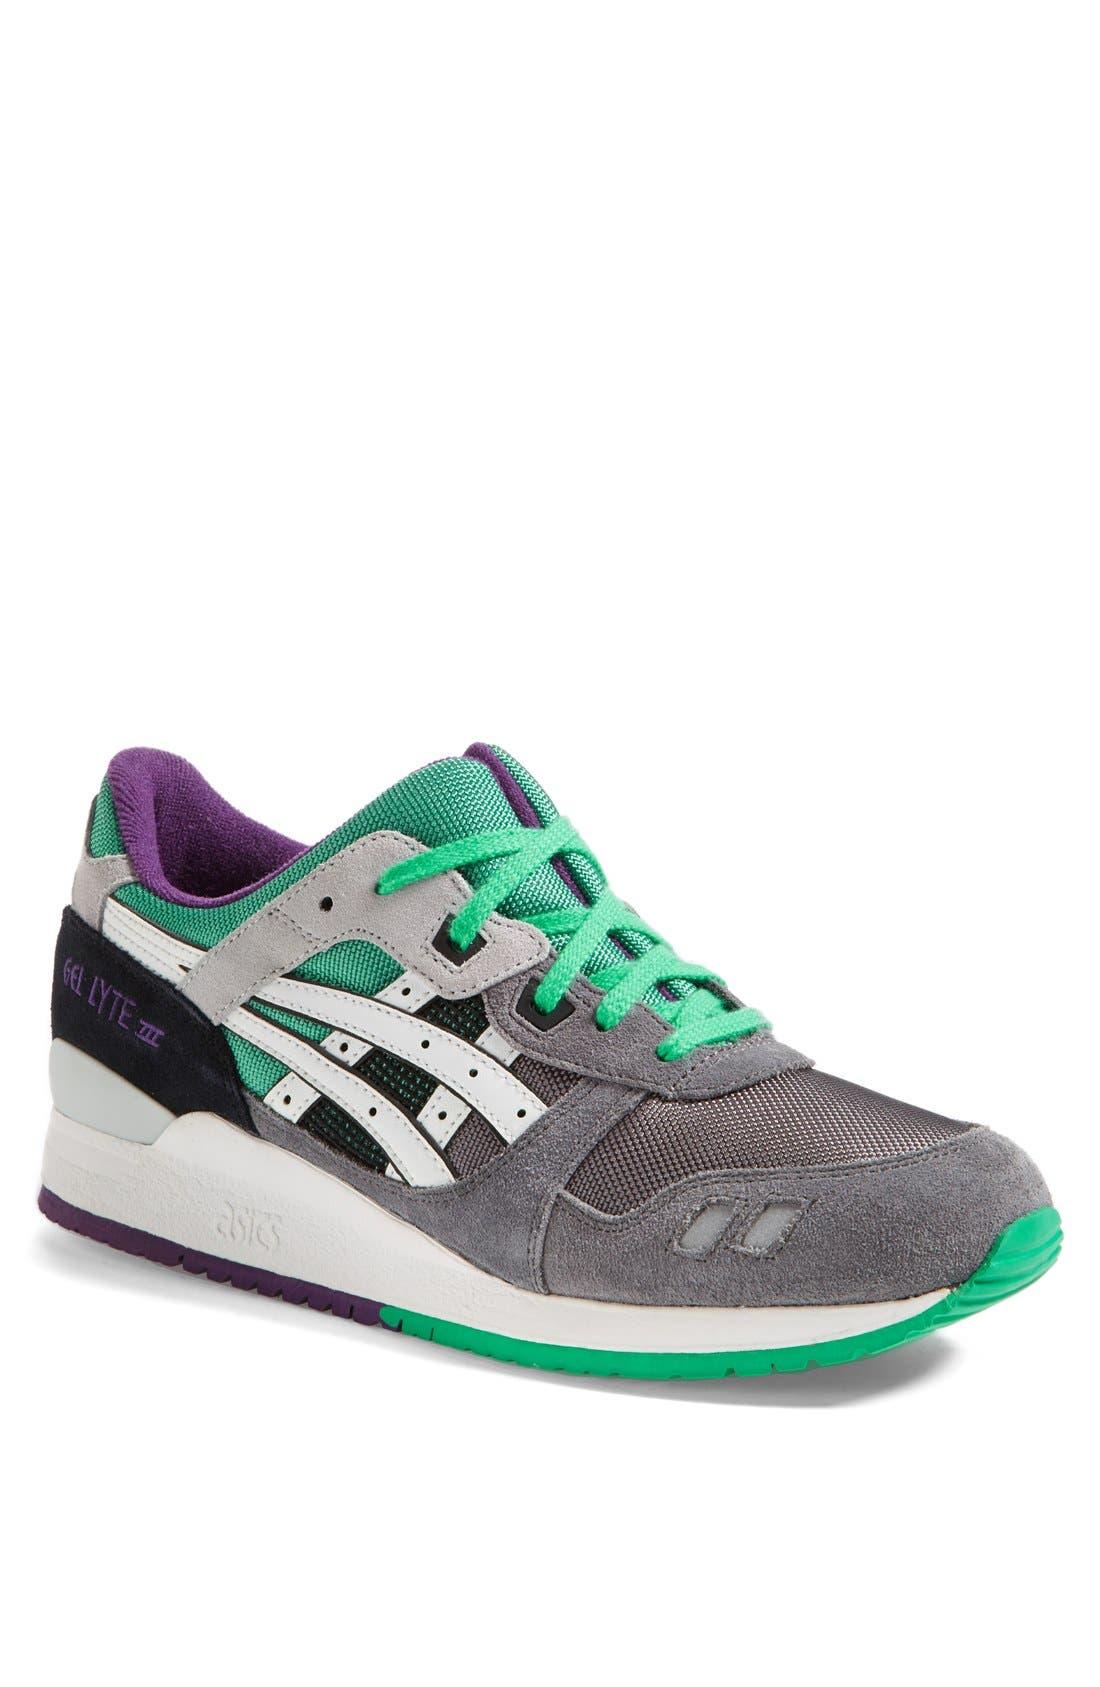 Main Image - ASICS® 'GEL-Lyte III' Sneaker (Men)